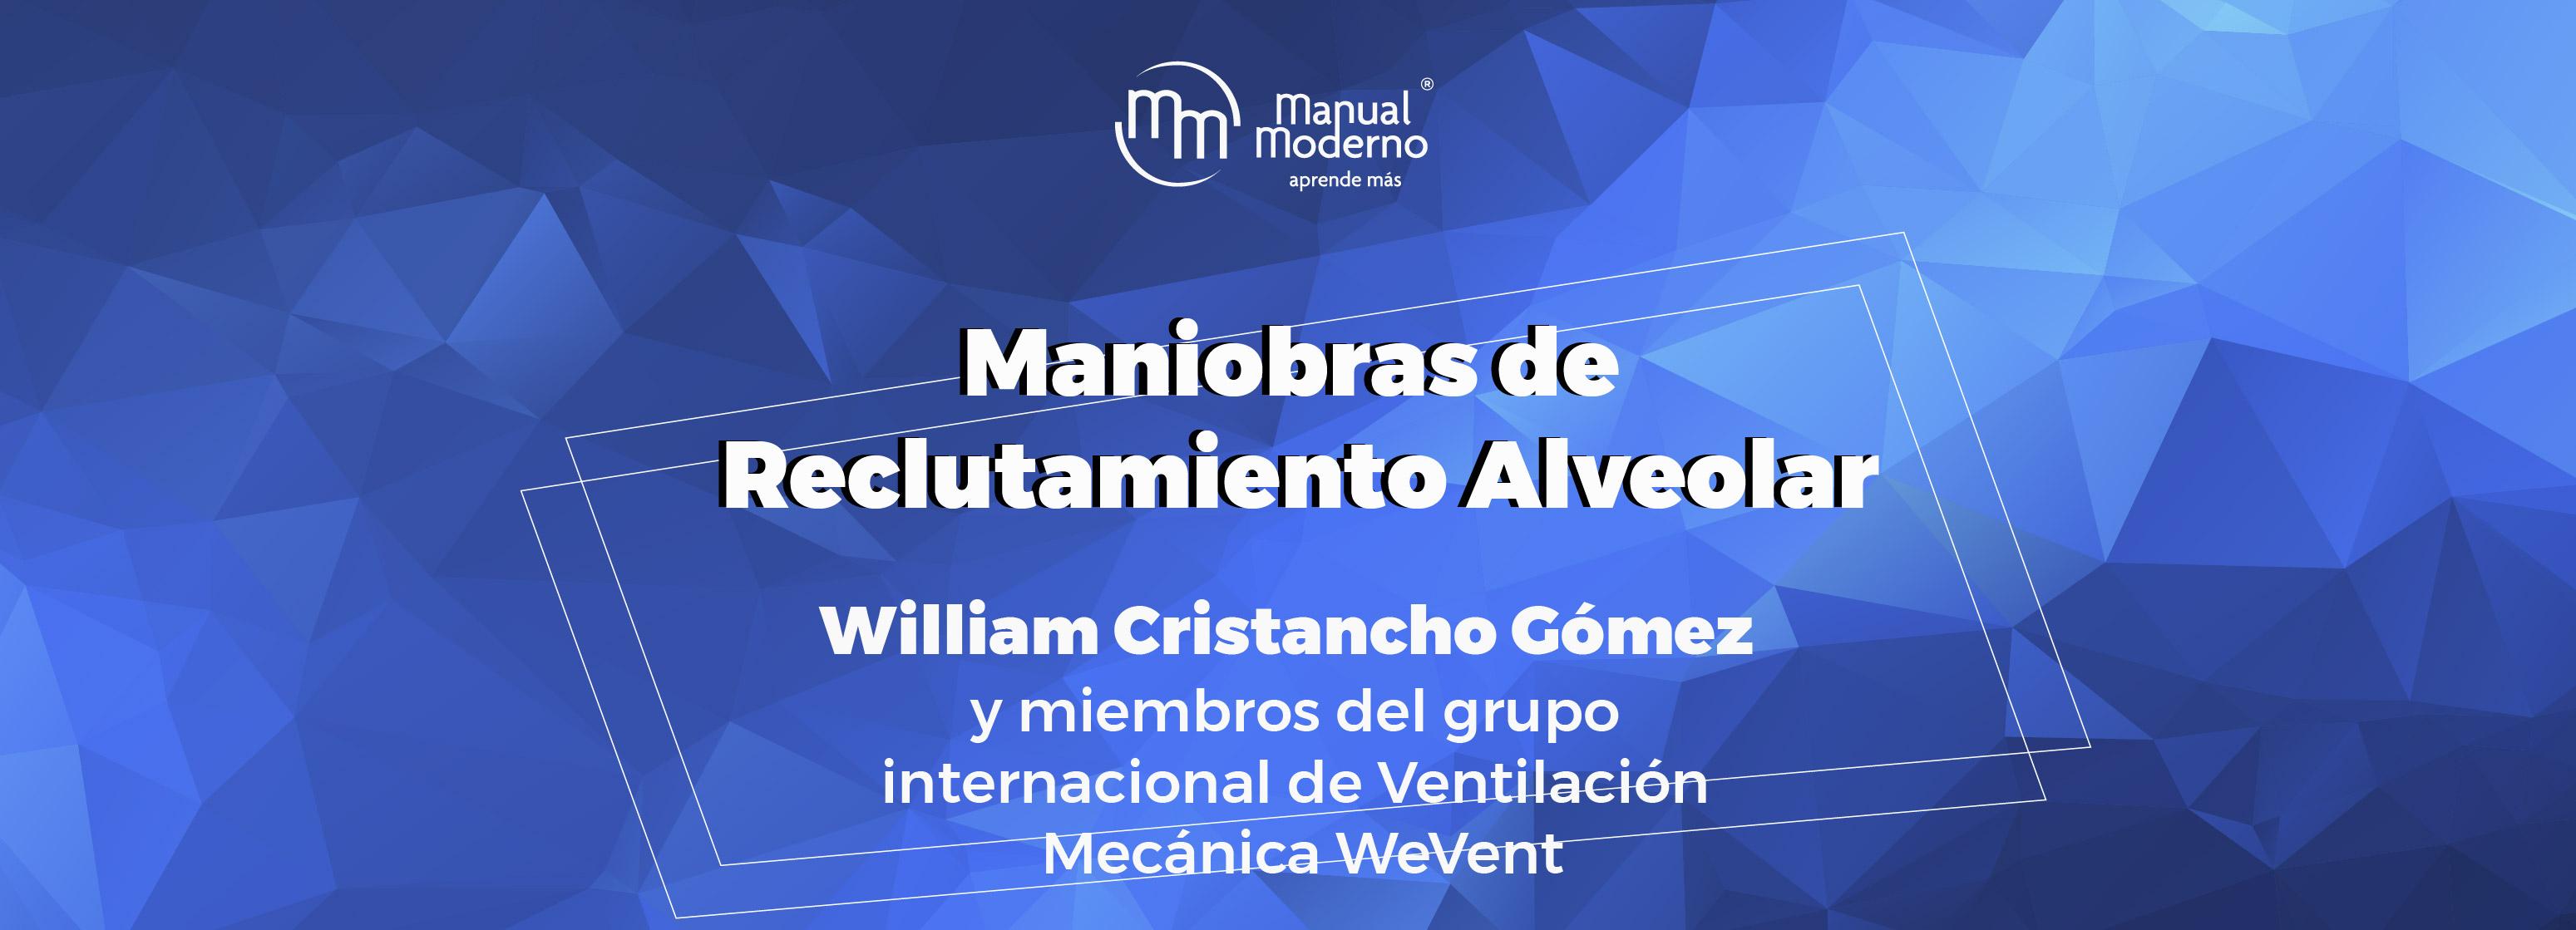 MANIOBRAS DE RECLUTAMIENTO ALVEOLAR